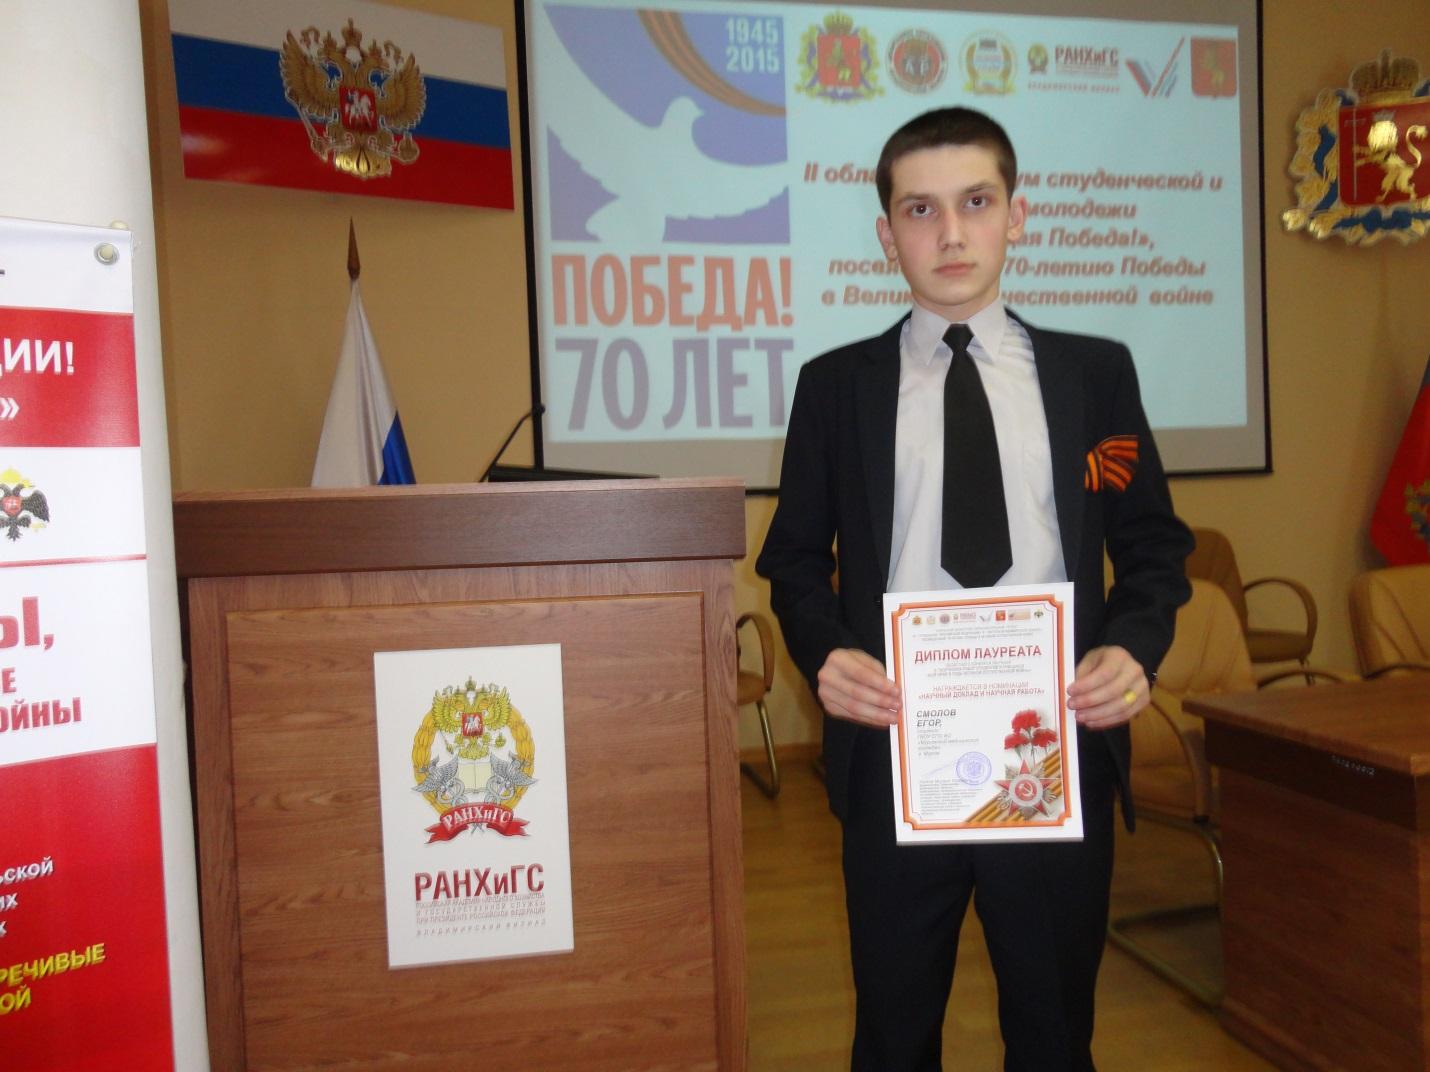 C:\Users\Методист\Desktop\Смолову Егору на конкурс\DSC01464.JPG